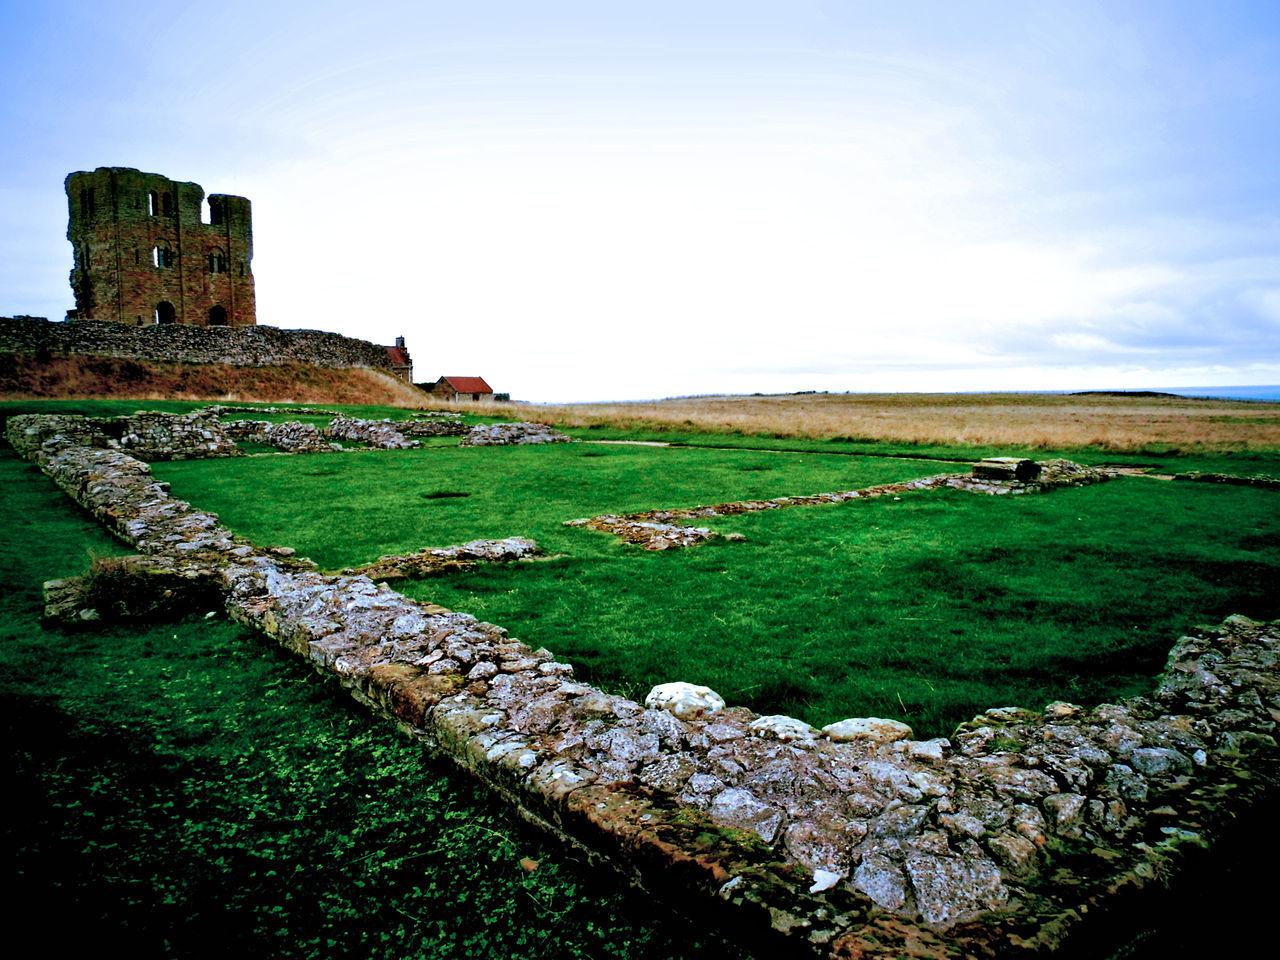 Castle On Grassy Field Against Sky